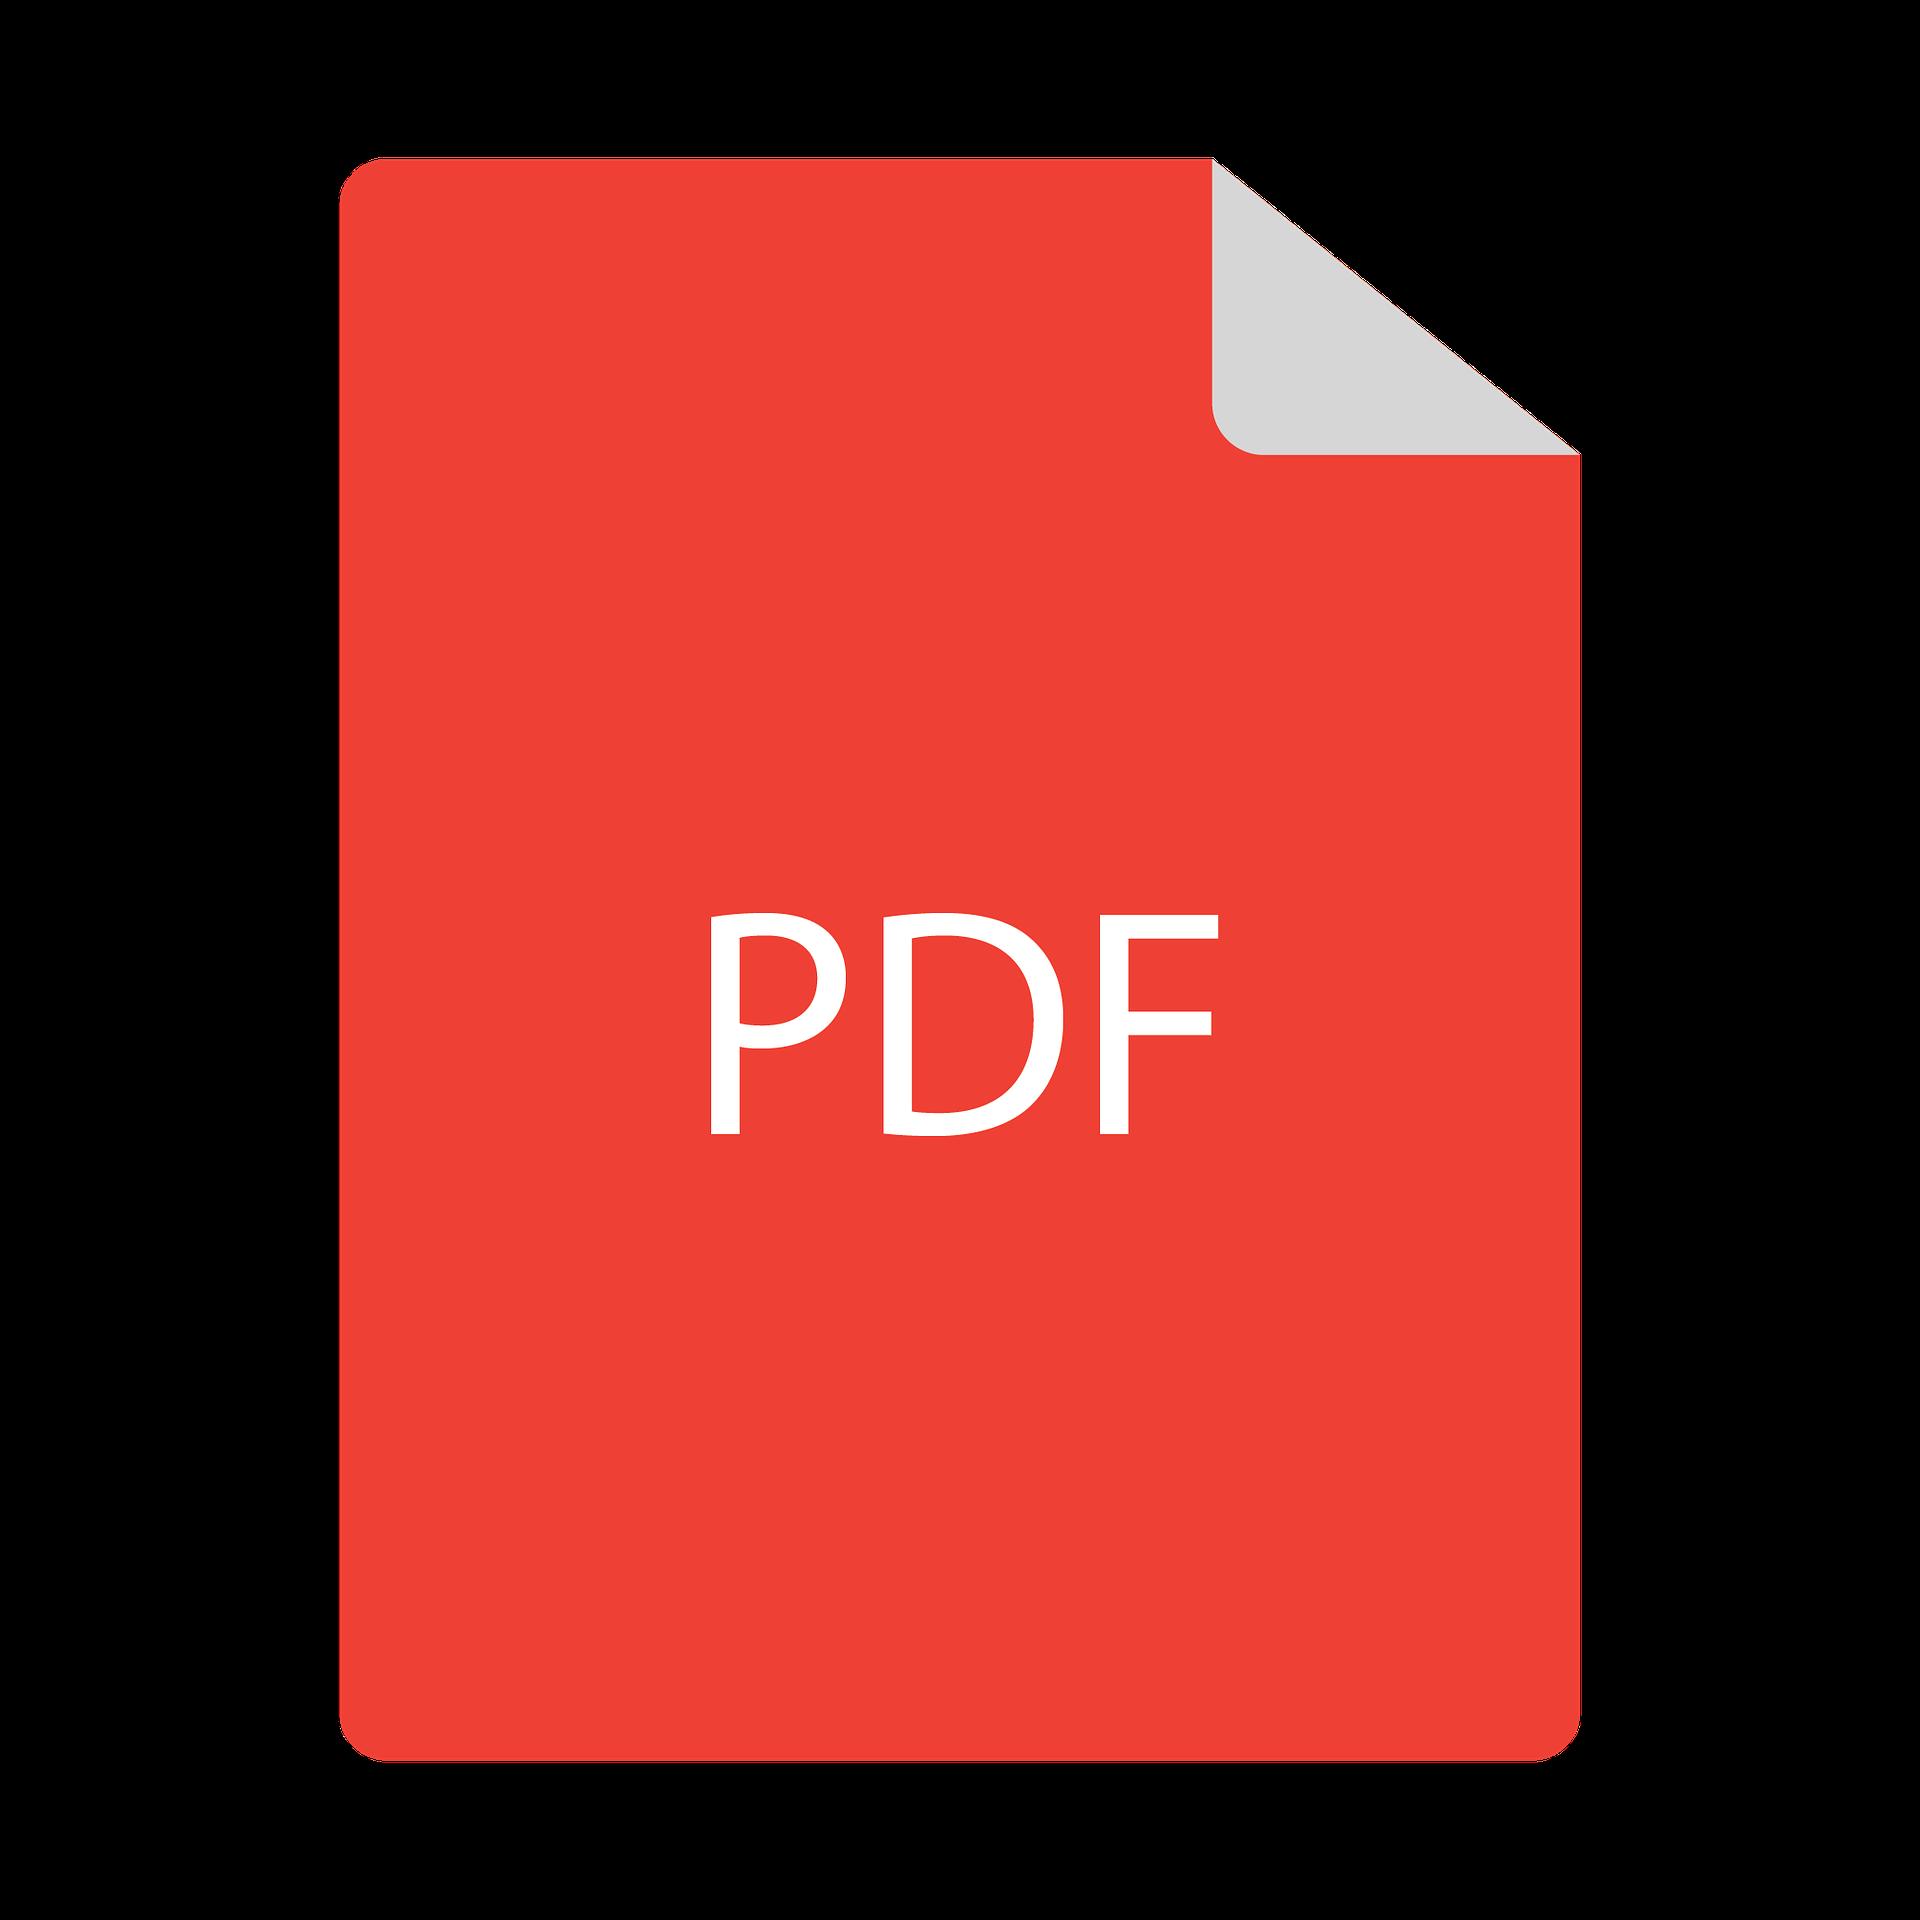 CONVERTIR WORD A PDF